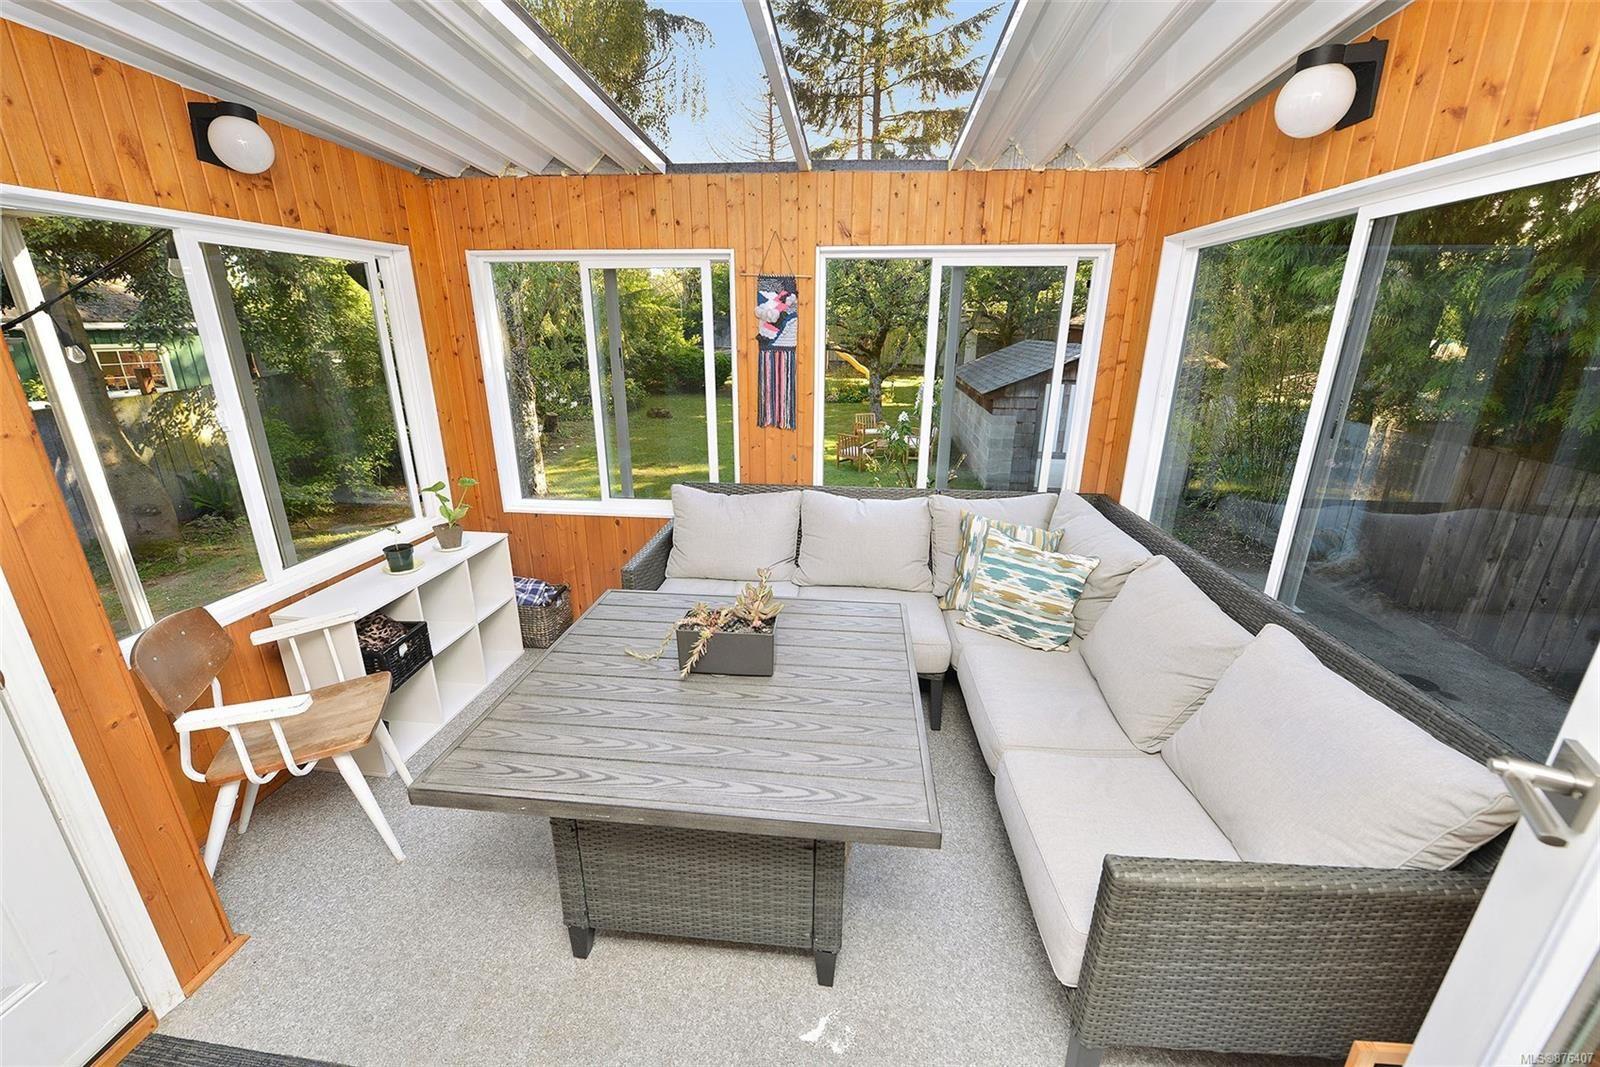 Photo 15: Photos: 631 Cowper St in Saanich: SW Gorge House for sale (Saanich West)  : MLS®# 876407